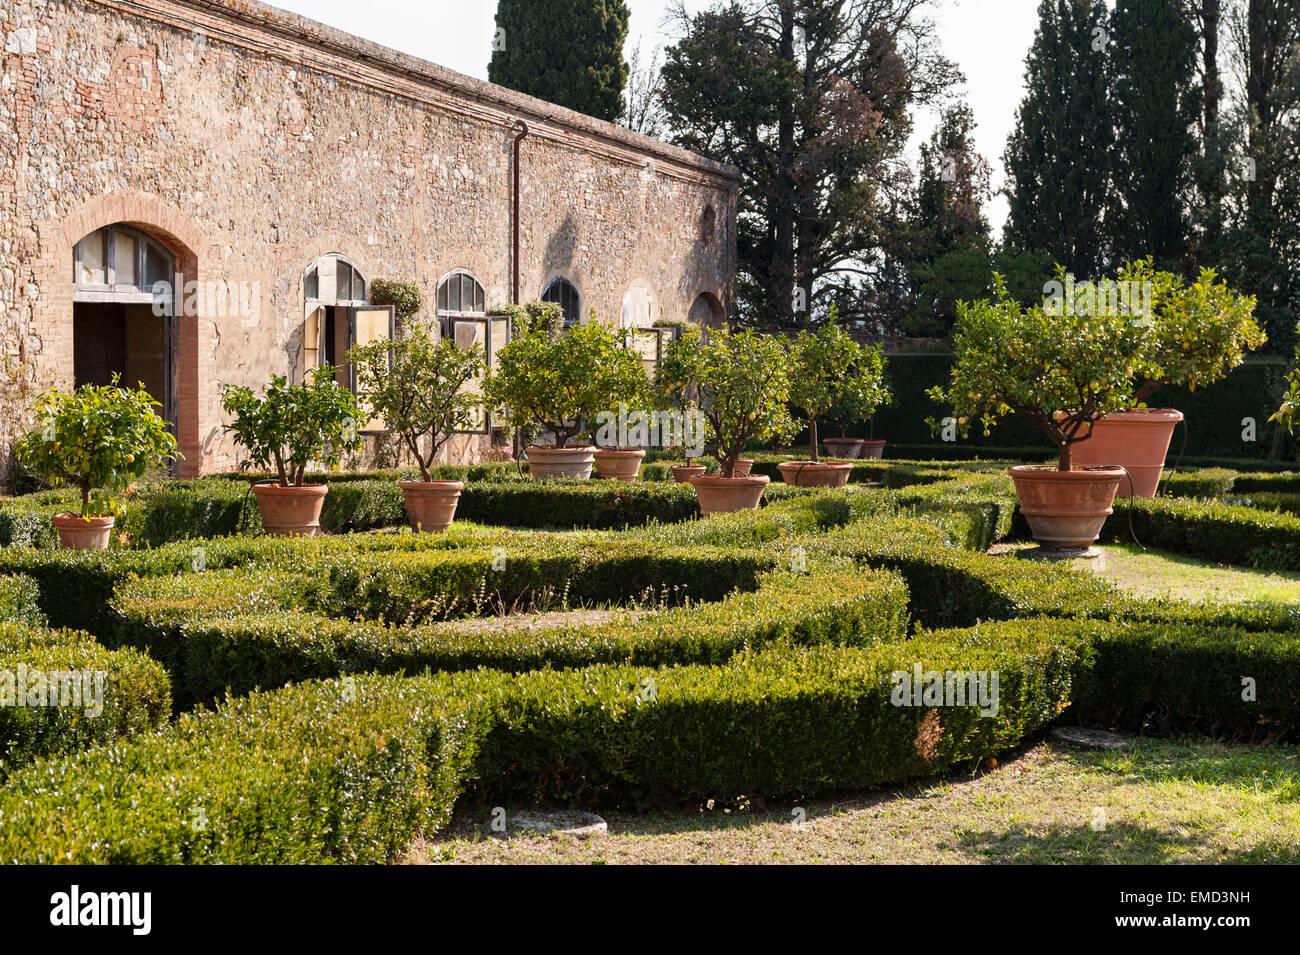 Vicobello siena toskana italien den formellen italienischen garten mit zugeschnittenen - Toskana garten ...